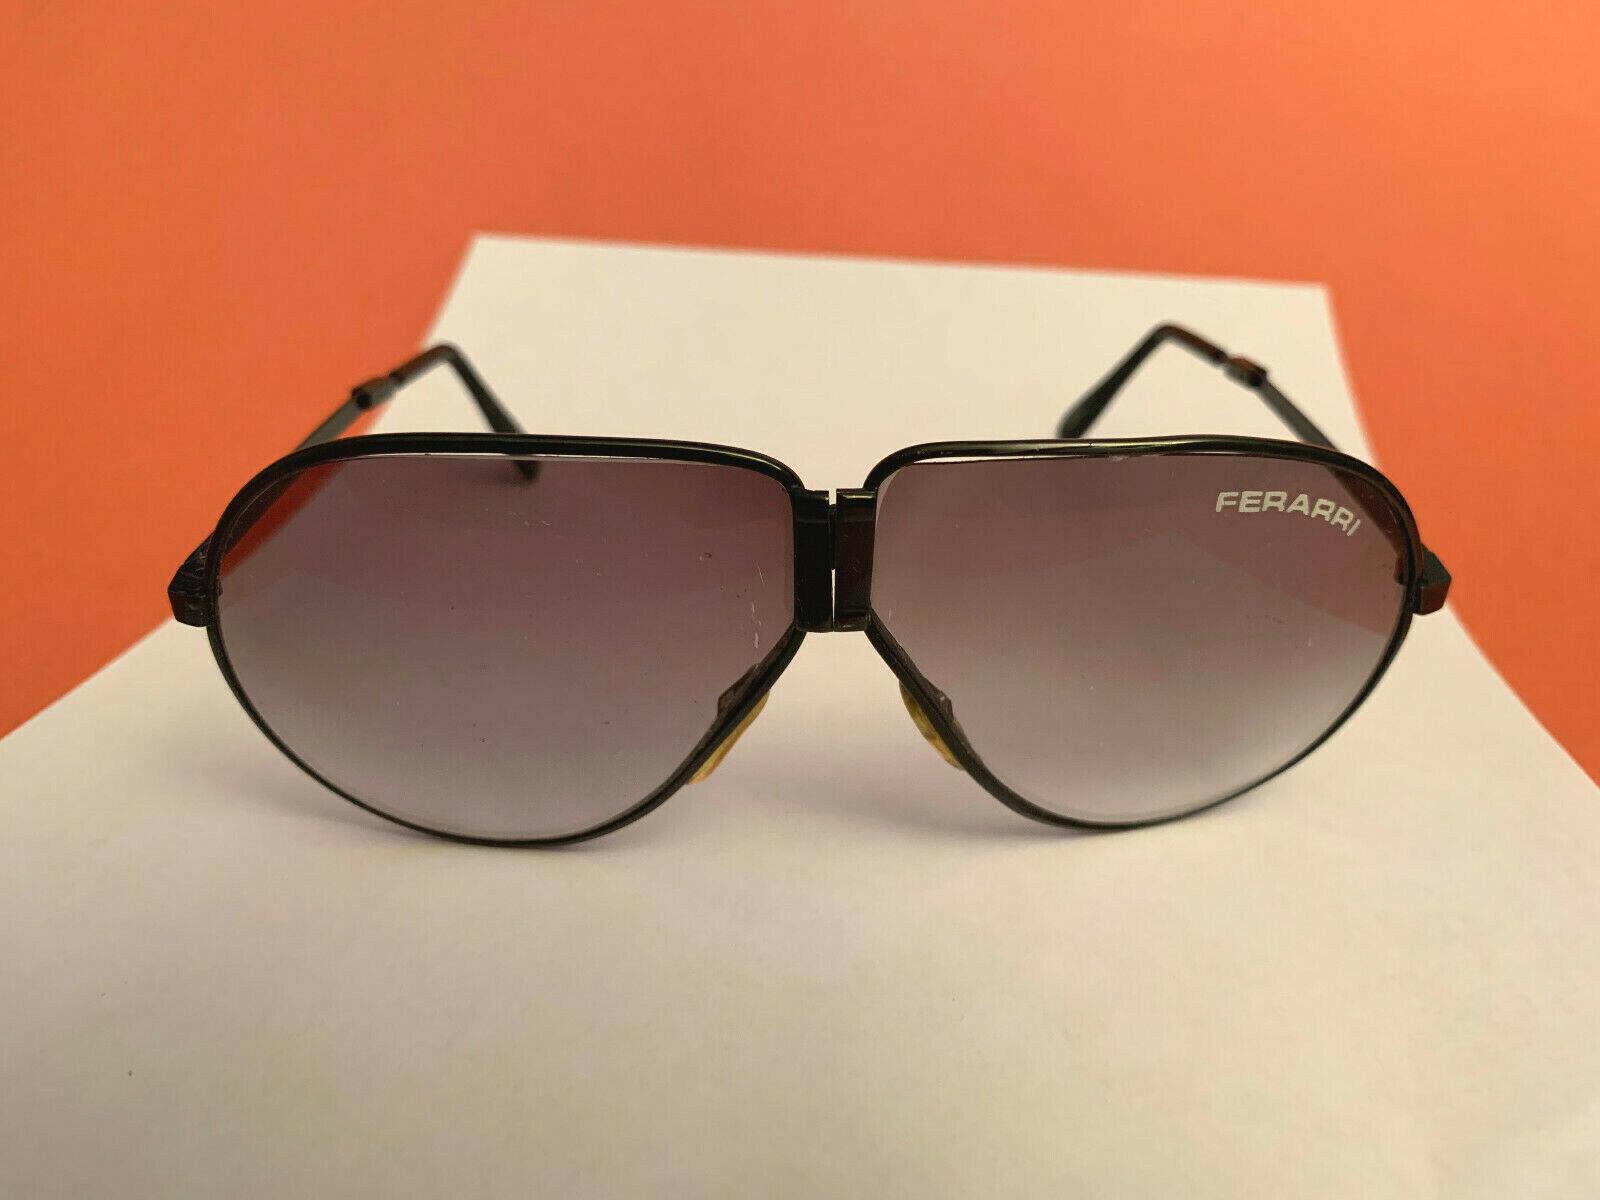 Vintage Ferrari Folding Sunglasses With Zip Case Gem